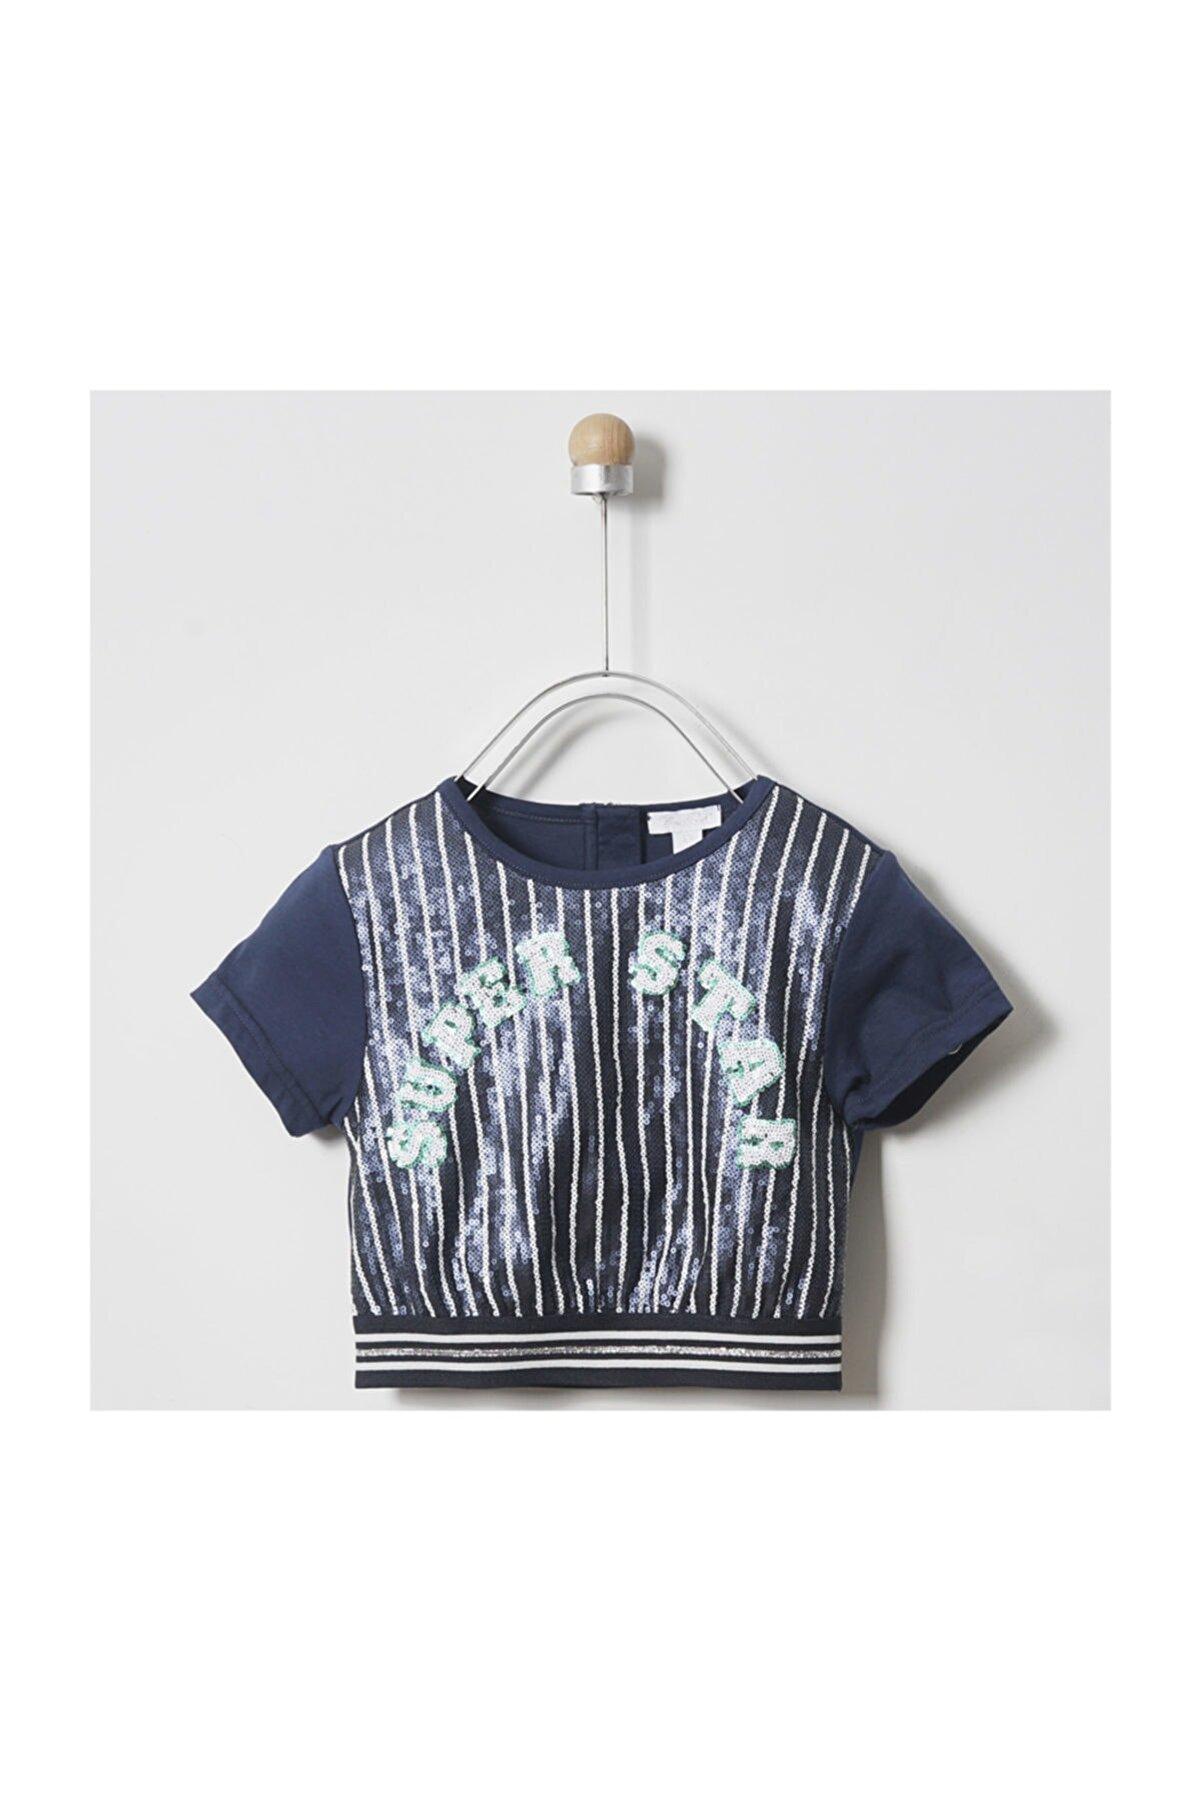 Panço Kız Çocuk T-shirt 2011gk05009